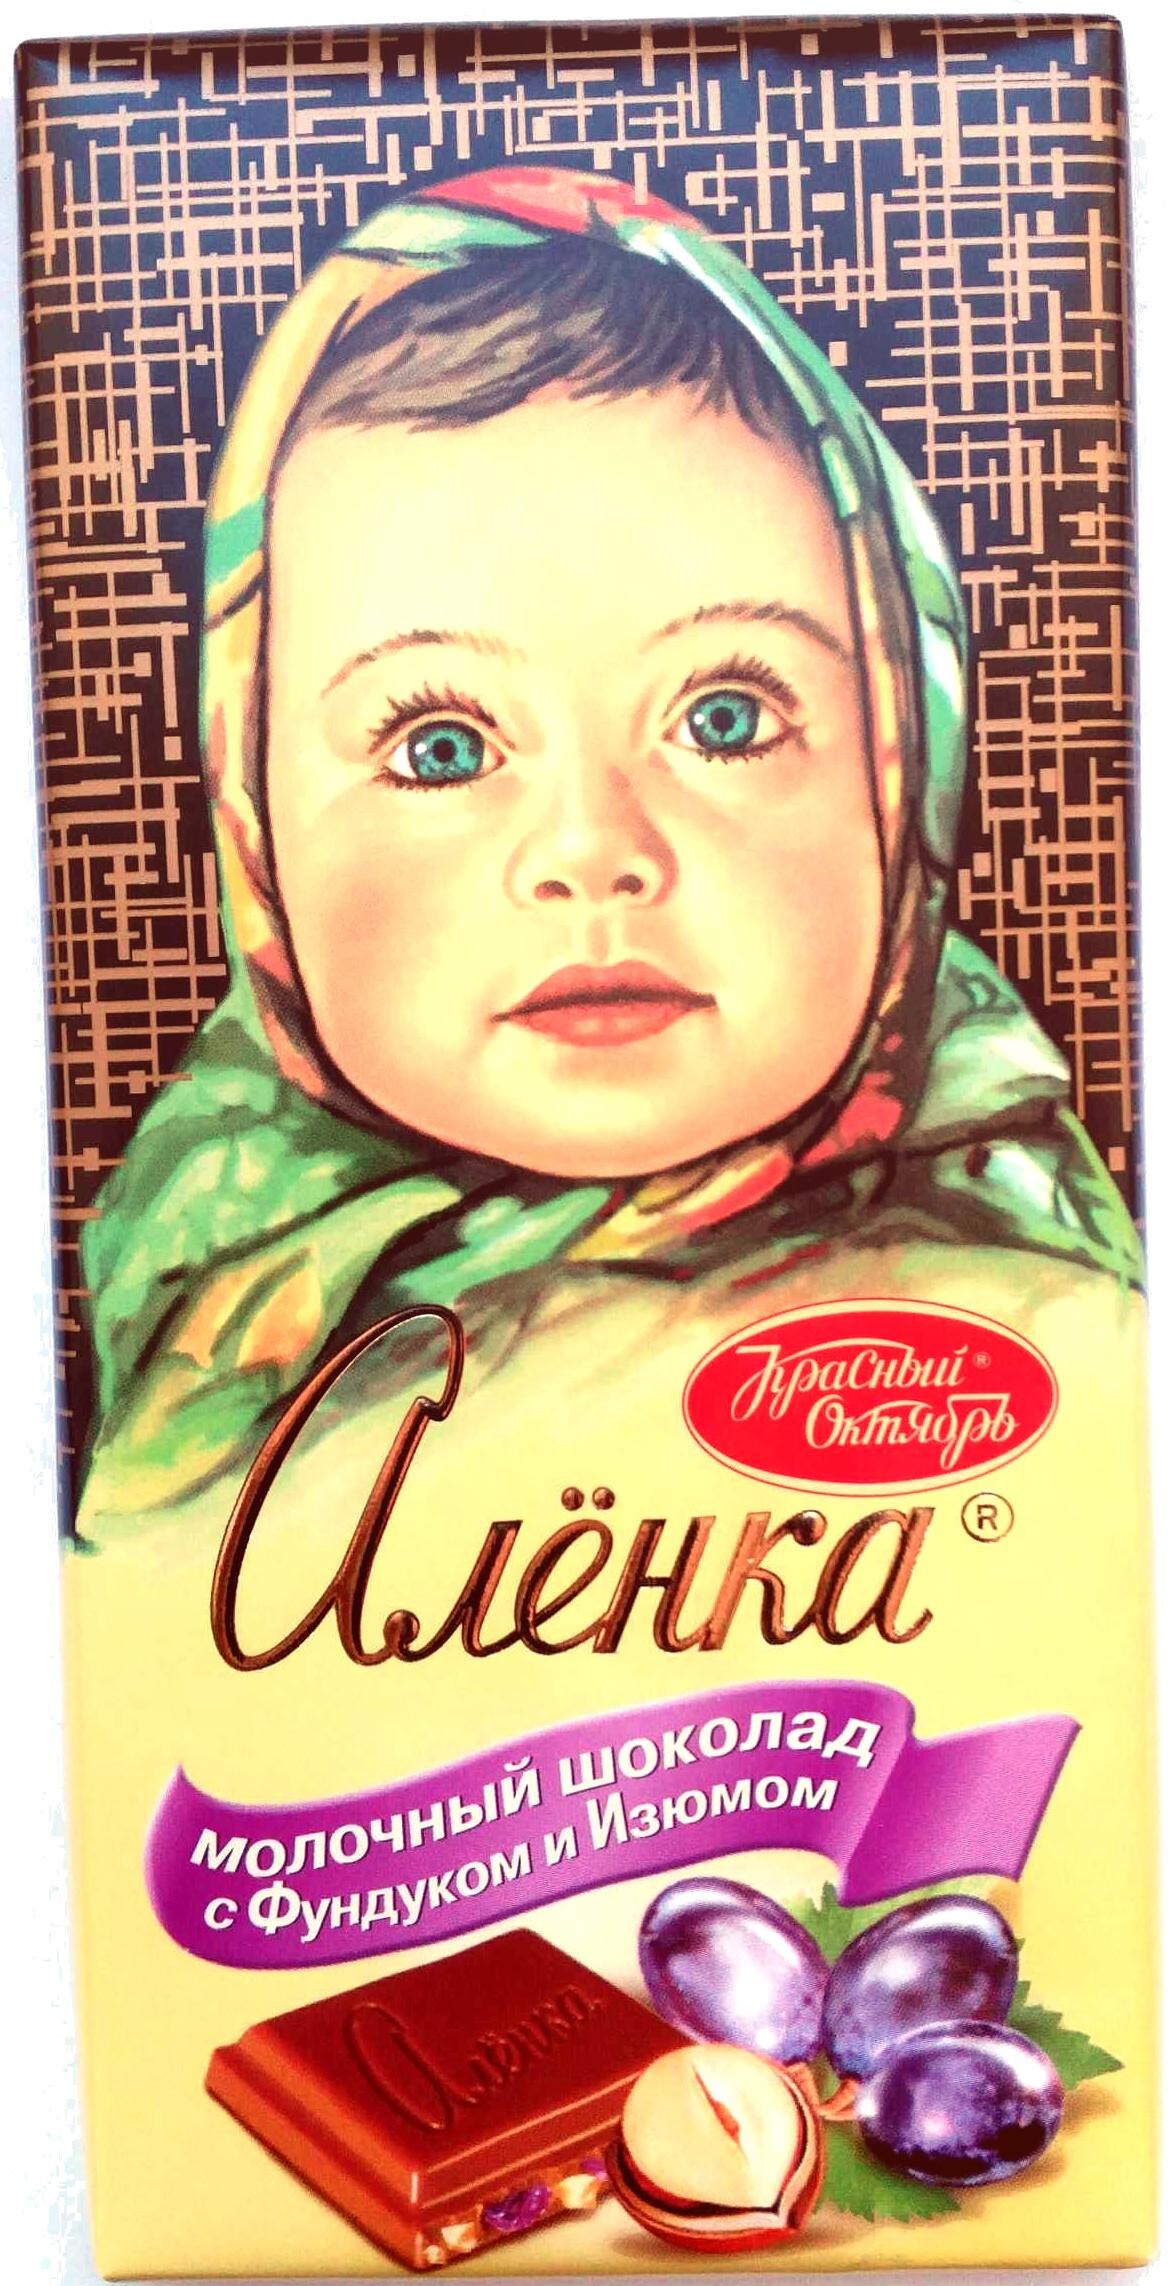 Chocolat noisettes/raisin - 100 G - Product - ru